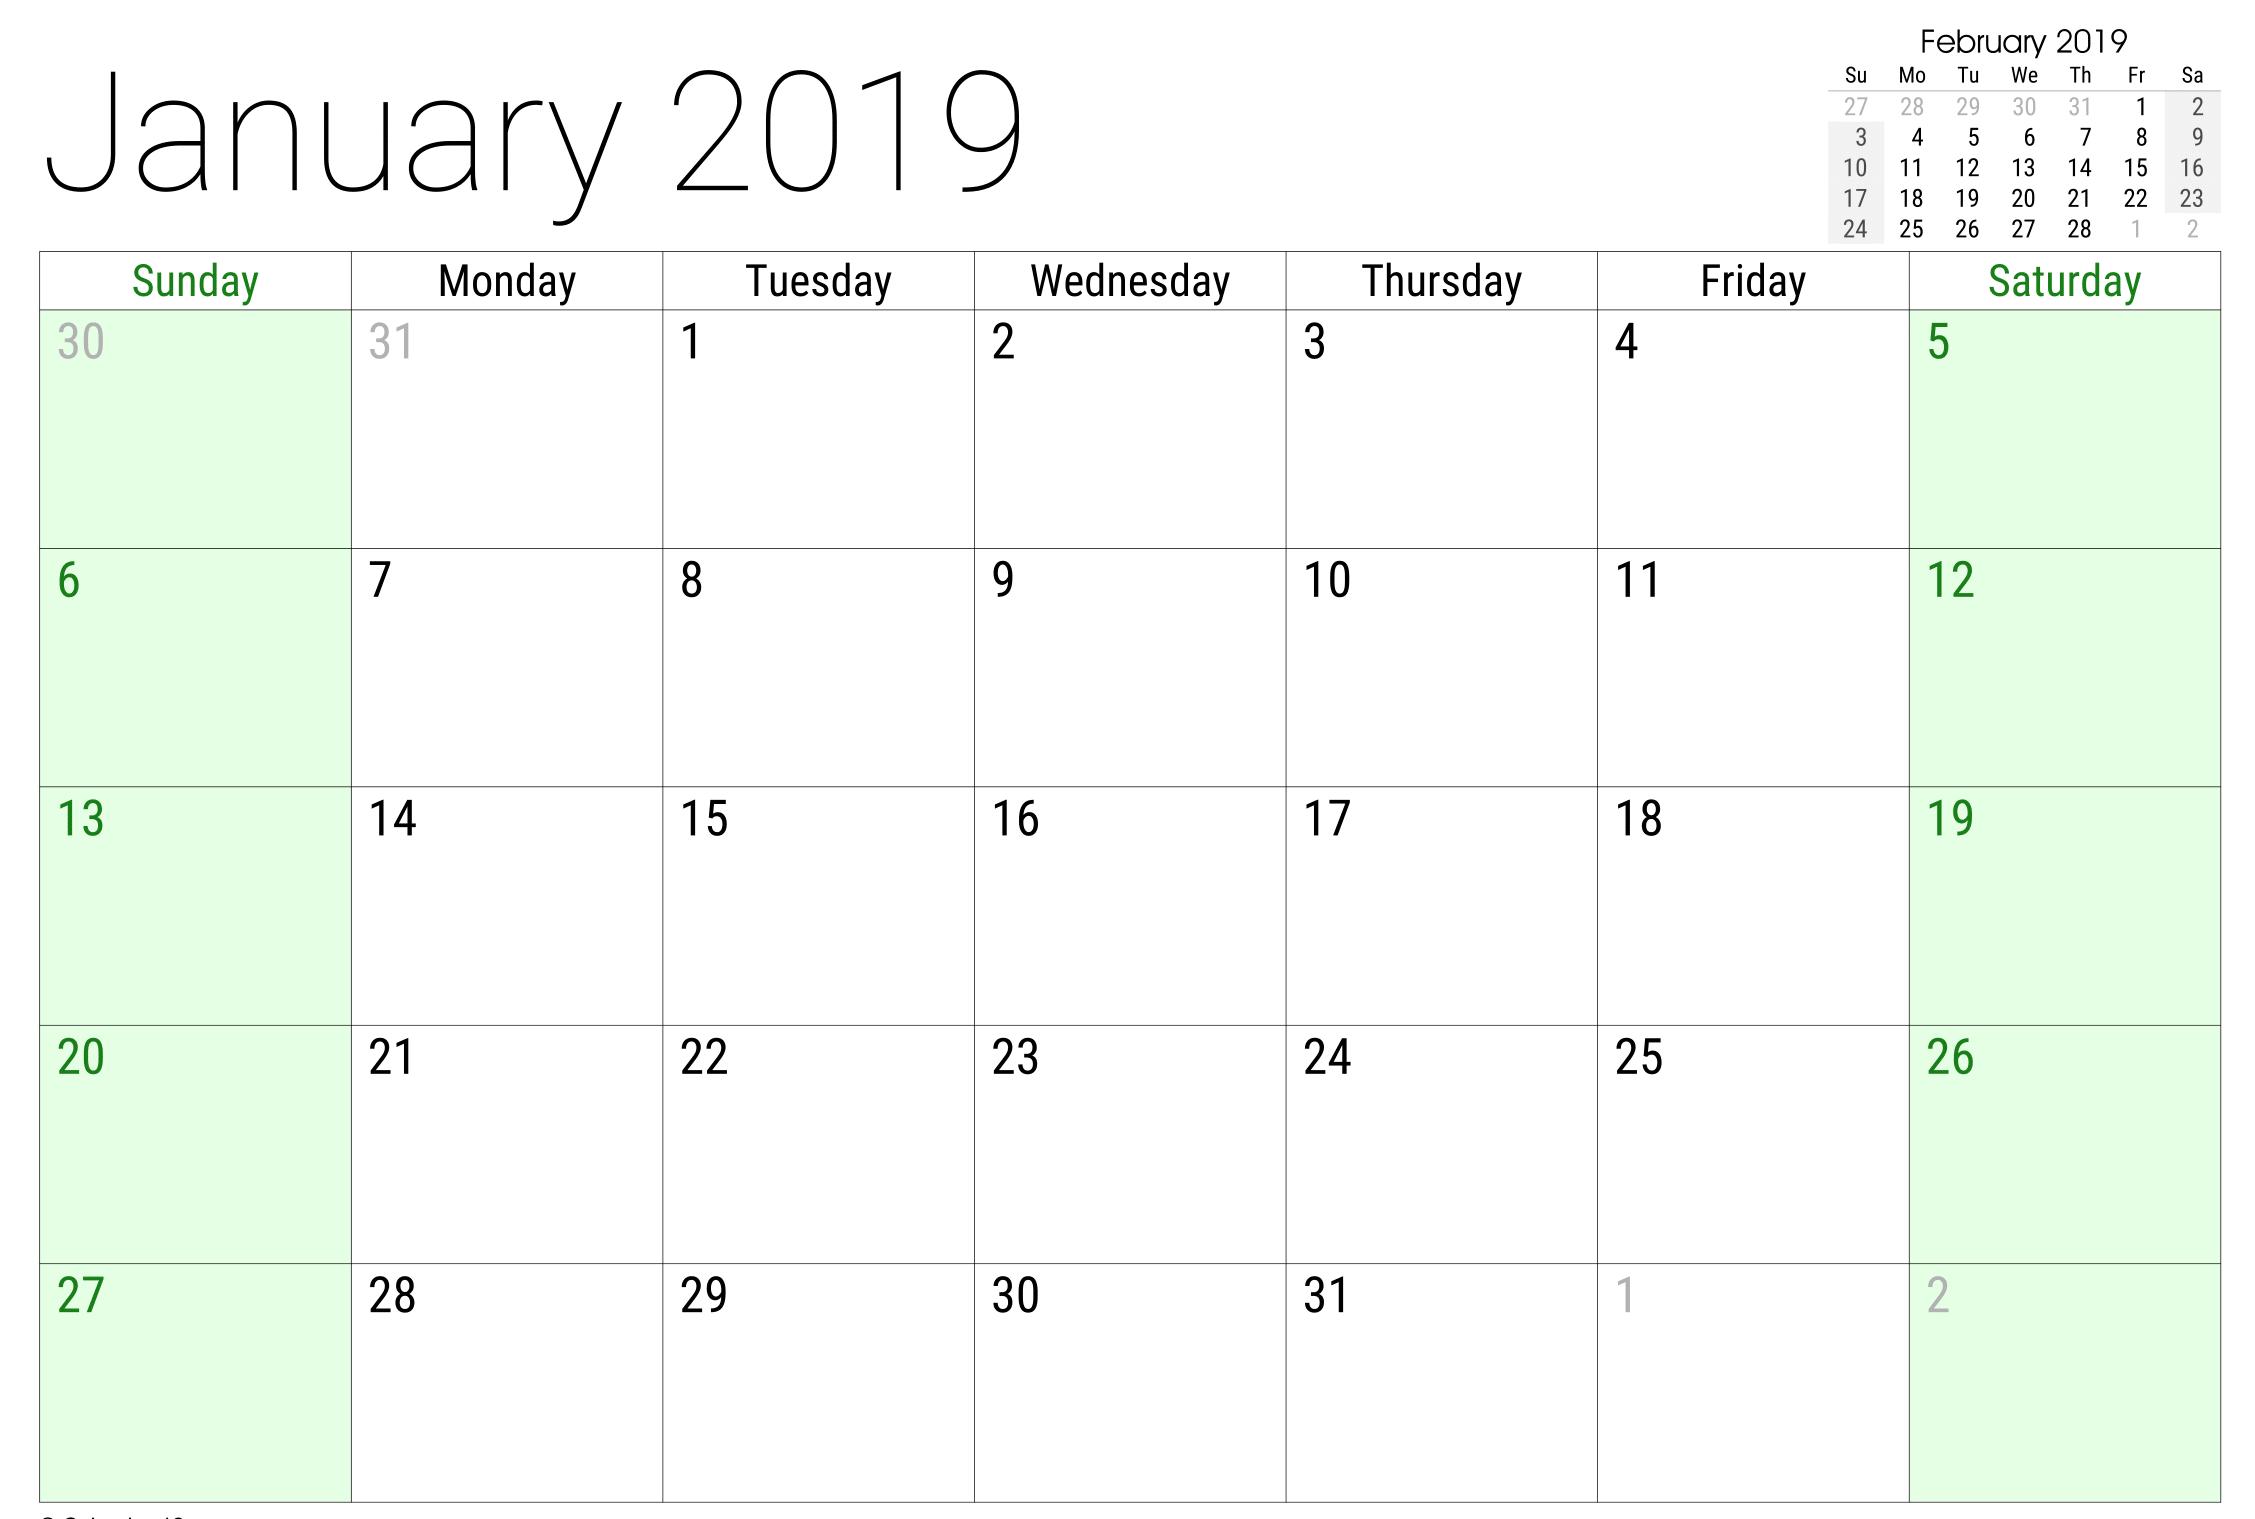 January 2019 Google Spreadsheet Calendar Editable Template